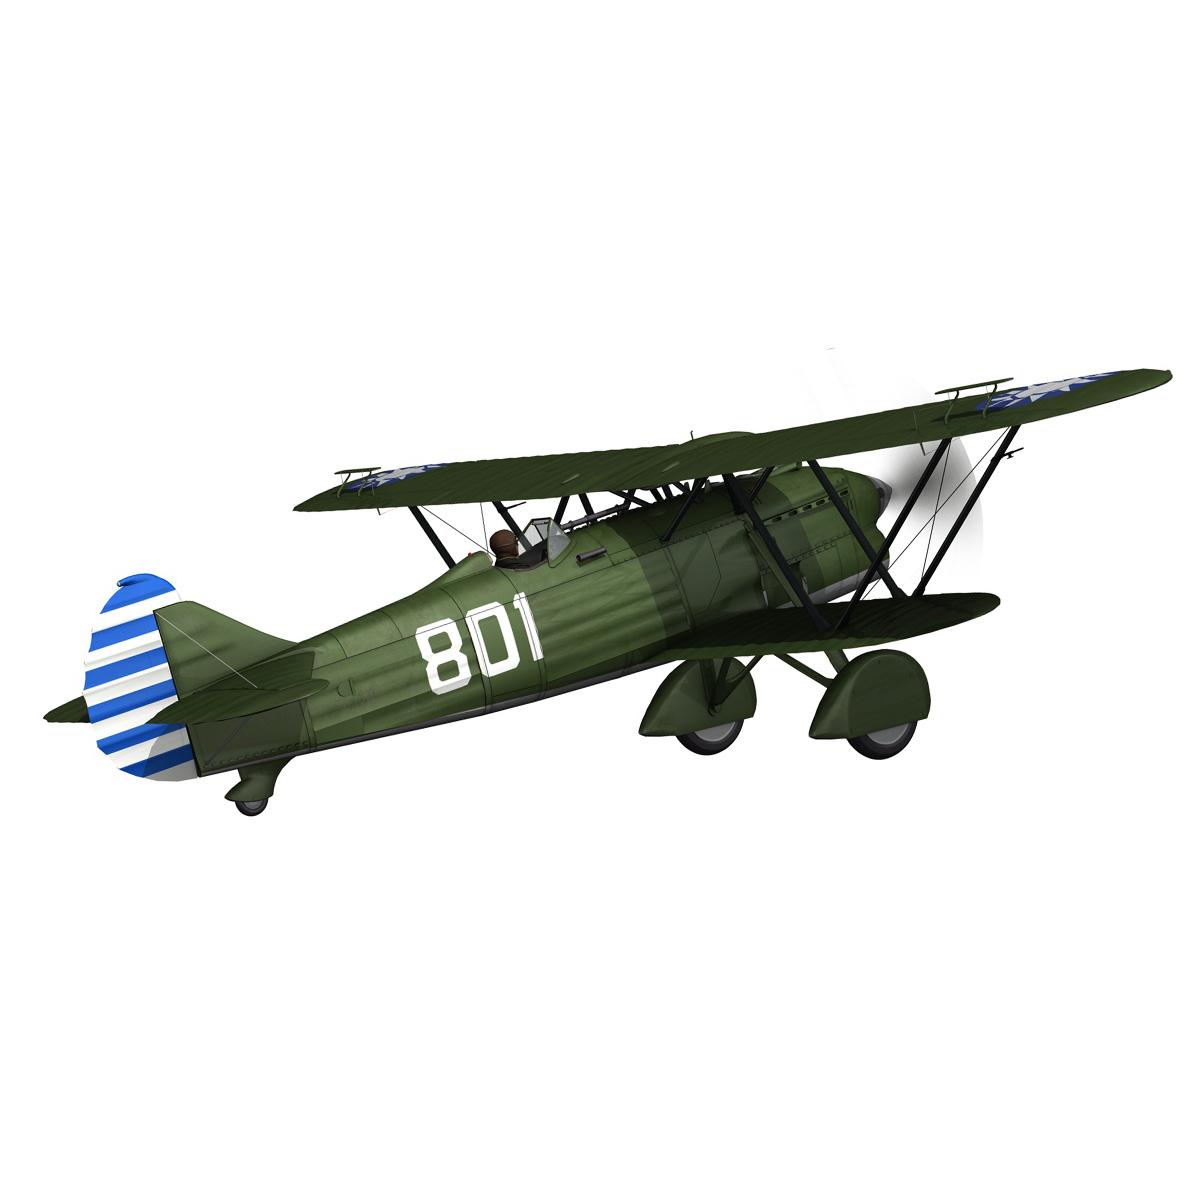 fiat cr.32 – chinese nationalist air force 3d model fbx c4d lwo obj 272628